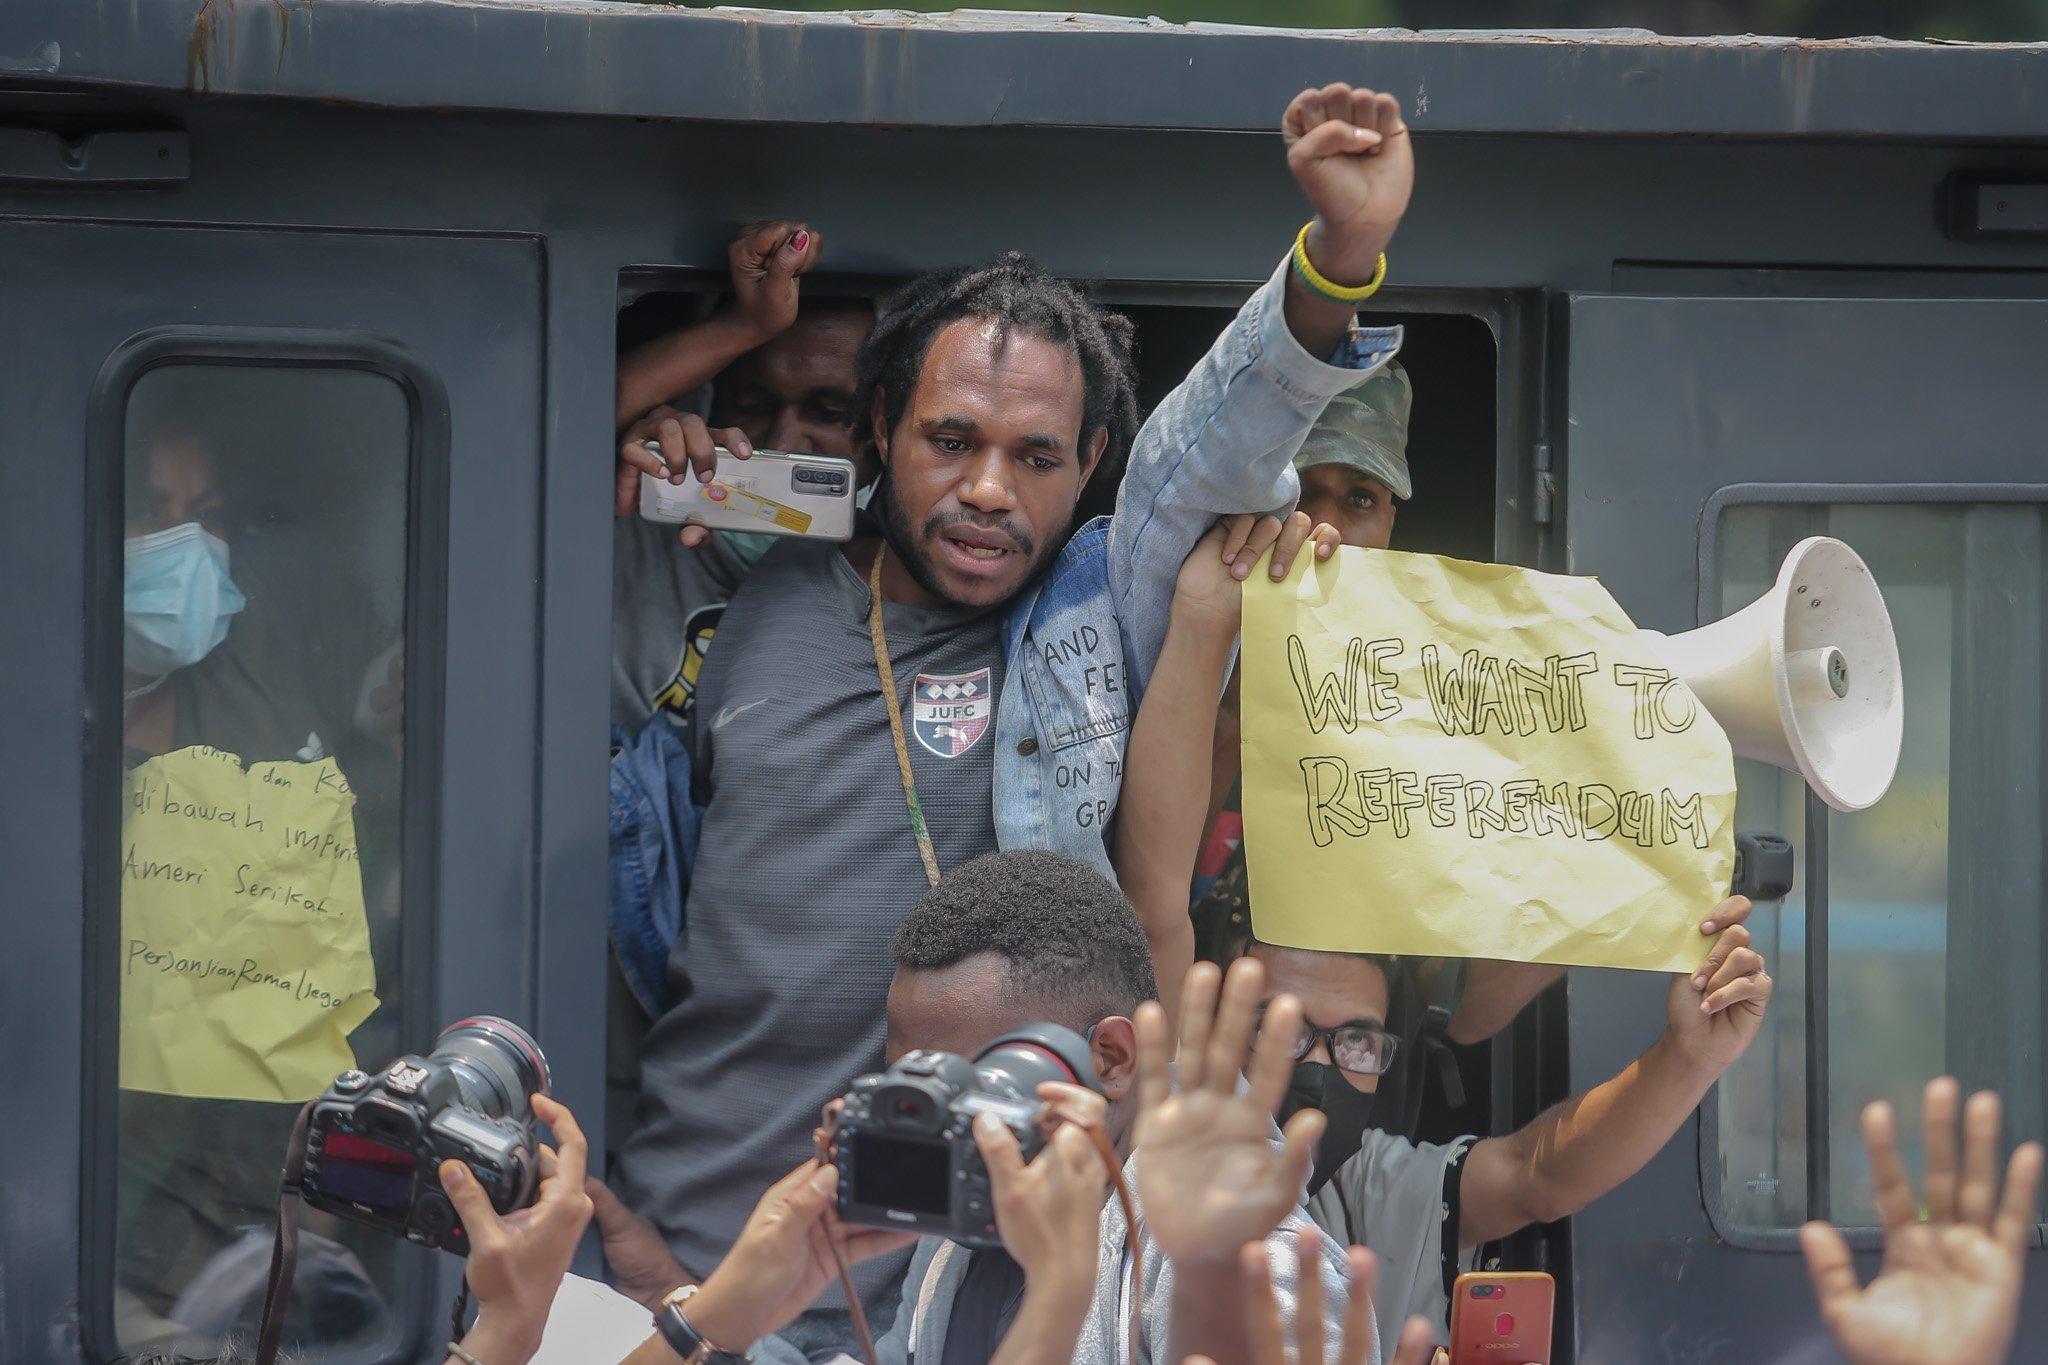 Sejumlah pengunjuk rasa yang tergabung dalam Aliansi Mahasiswa Papua (AMP) diamankan pihak kepolisian saat menggelar aksi unjuk rasa peringatan Roma Agreement ke-59 di Depan Kedutaan Amerika Serikat, Jakarta, Kamis, (30/9/2021).